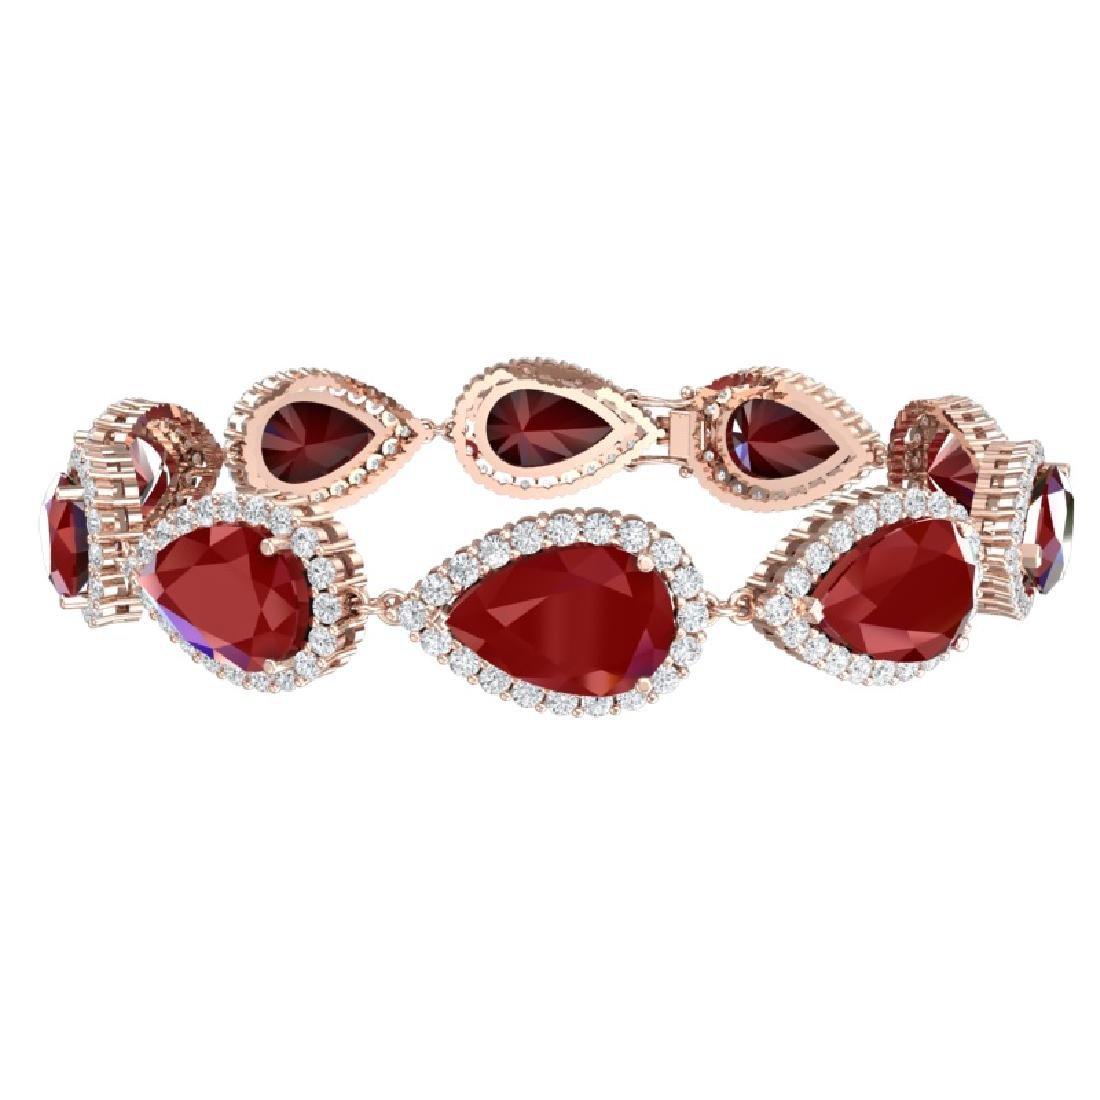 42 CTW Royalty Designer Ruby & VS Diamond Bracelet 18K - 3